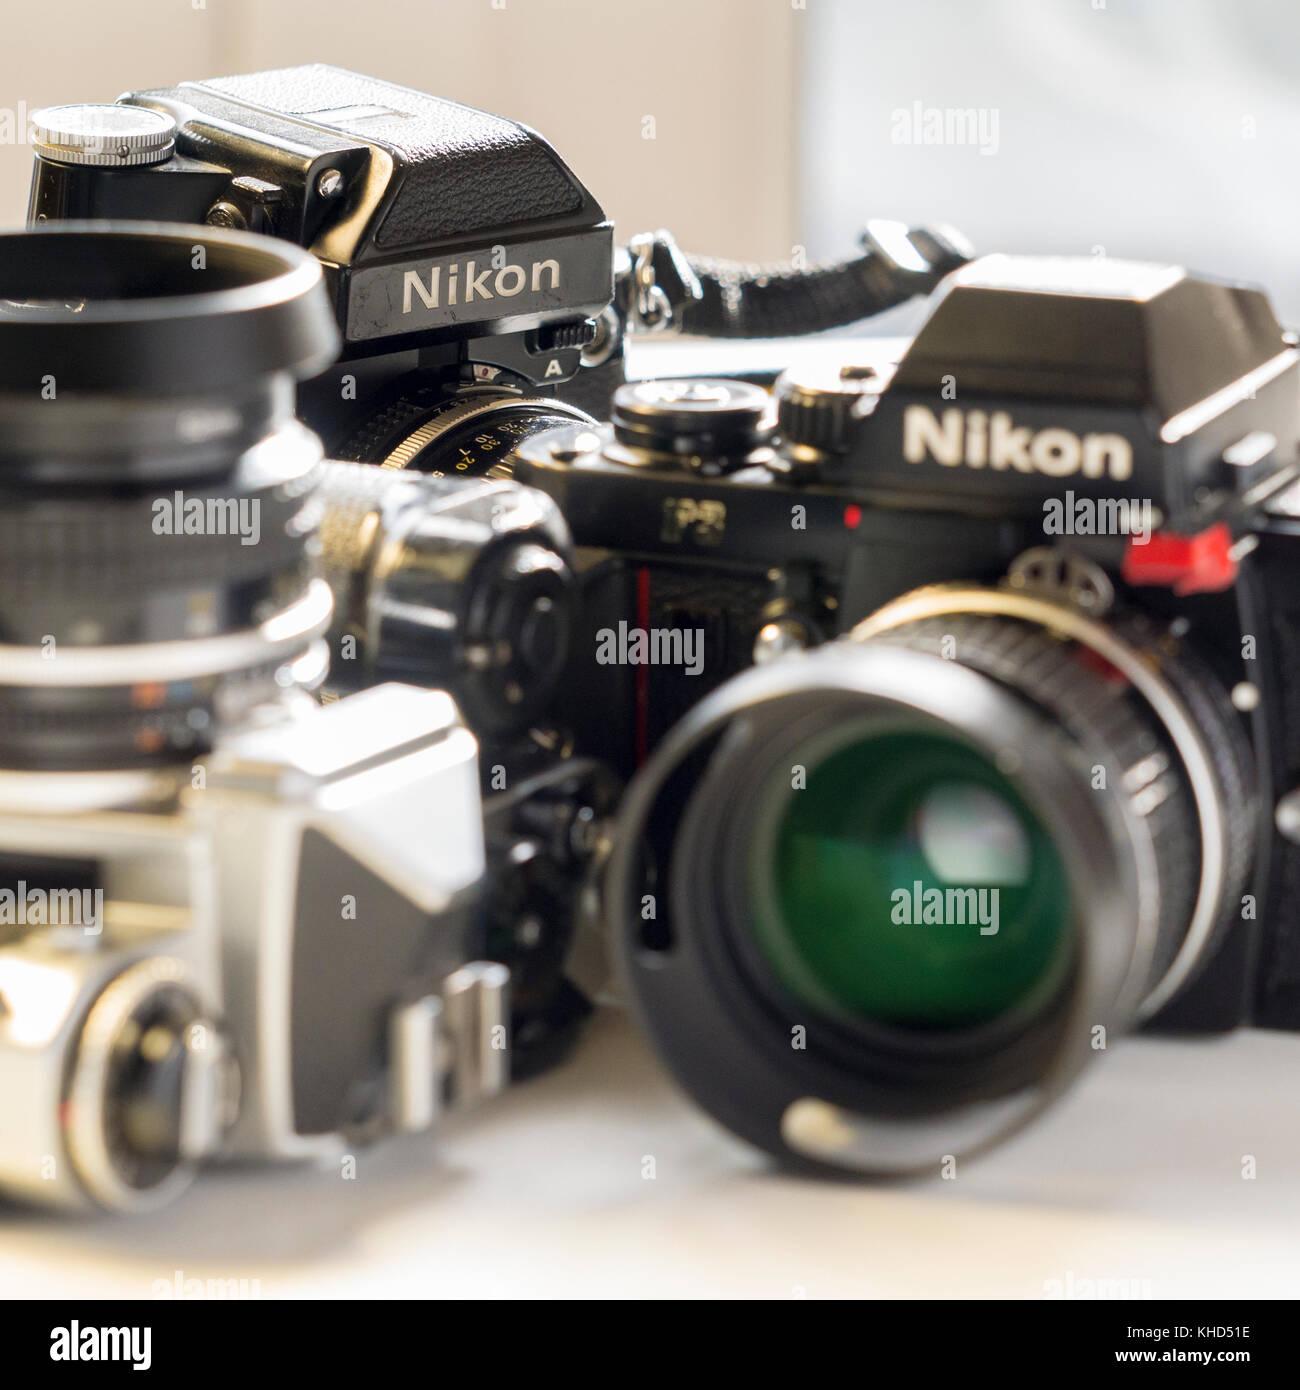 Nikon FE, Nikon FE and Nikon F3 single lens reflex 35mm professional film camera's, Nikon is Japanese company and Stock Photo